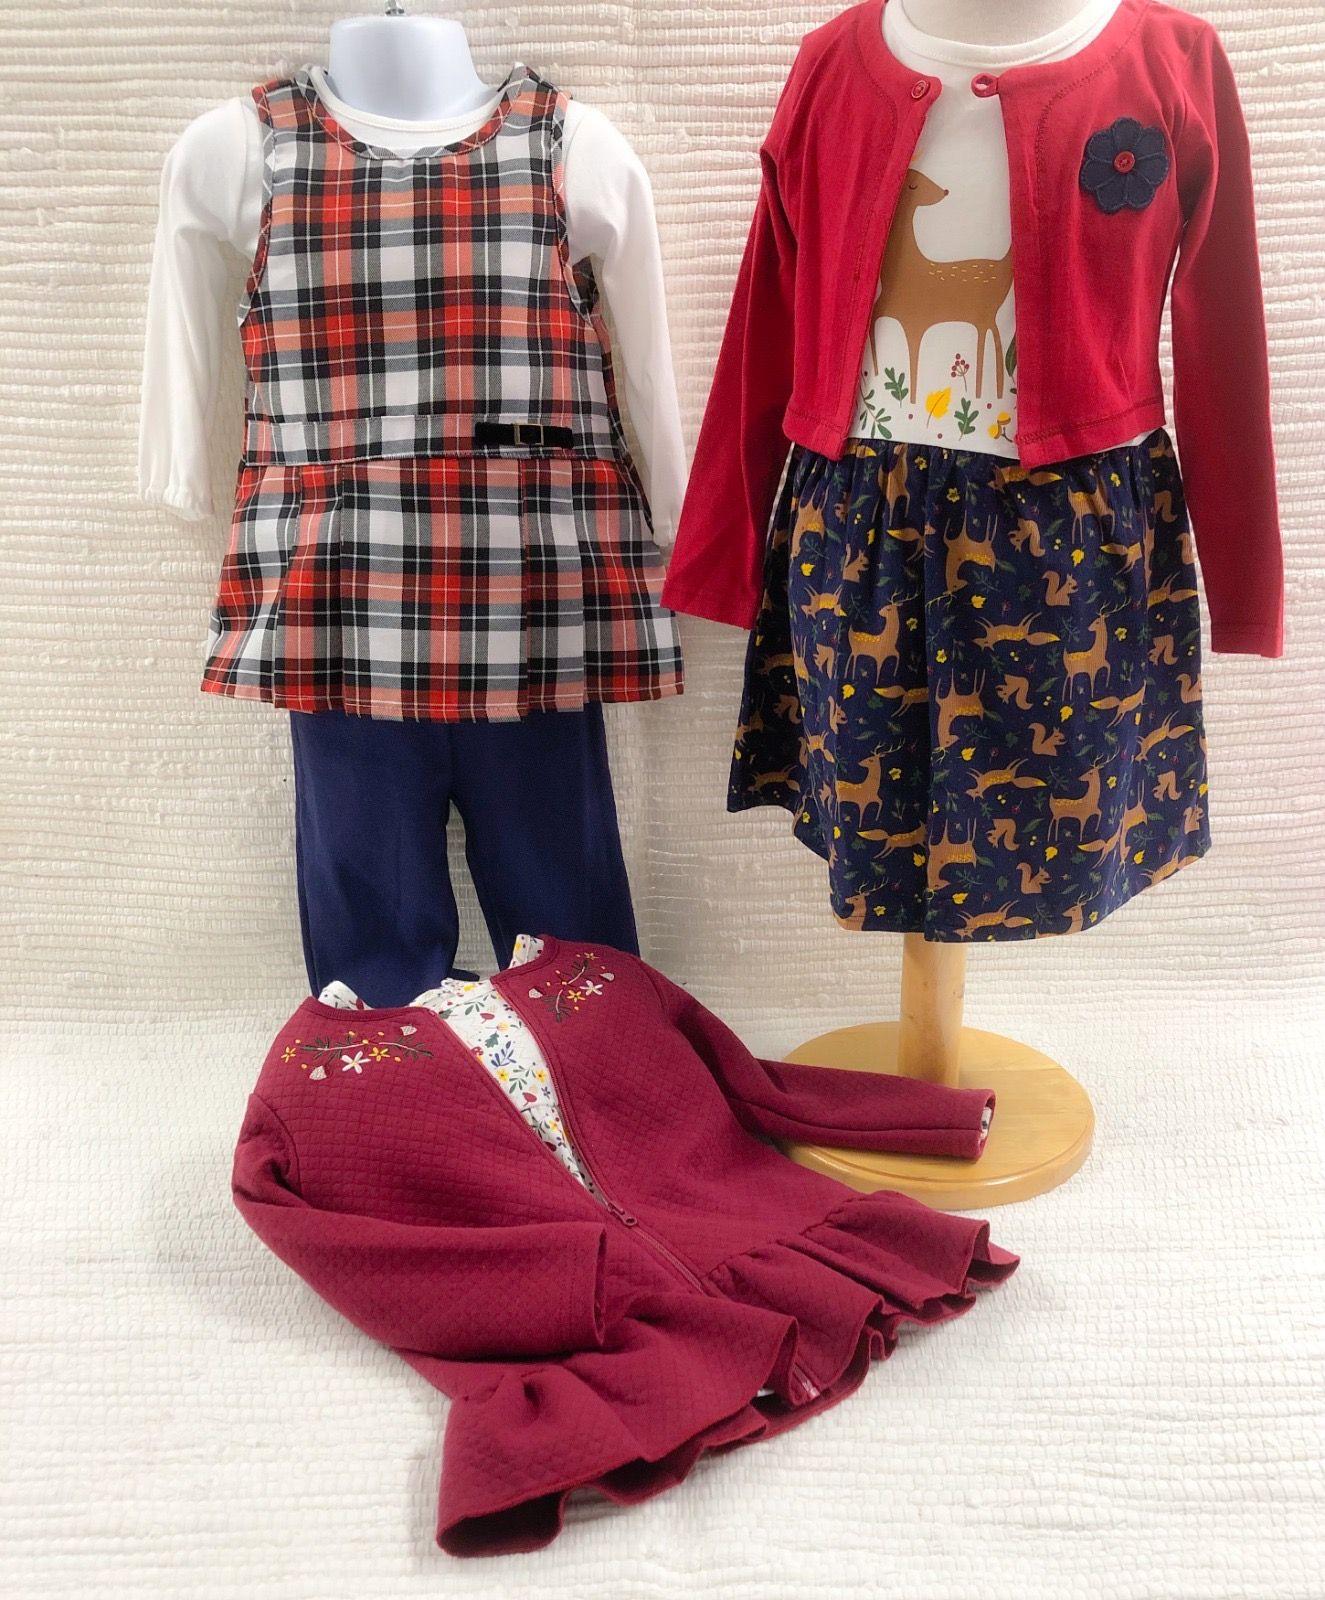 Girls Autumn Clothing Selection